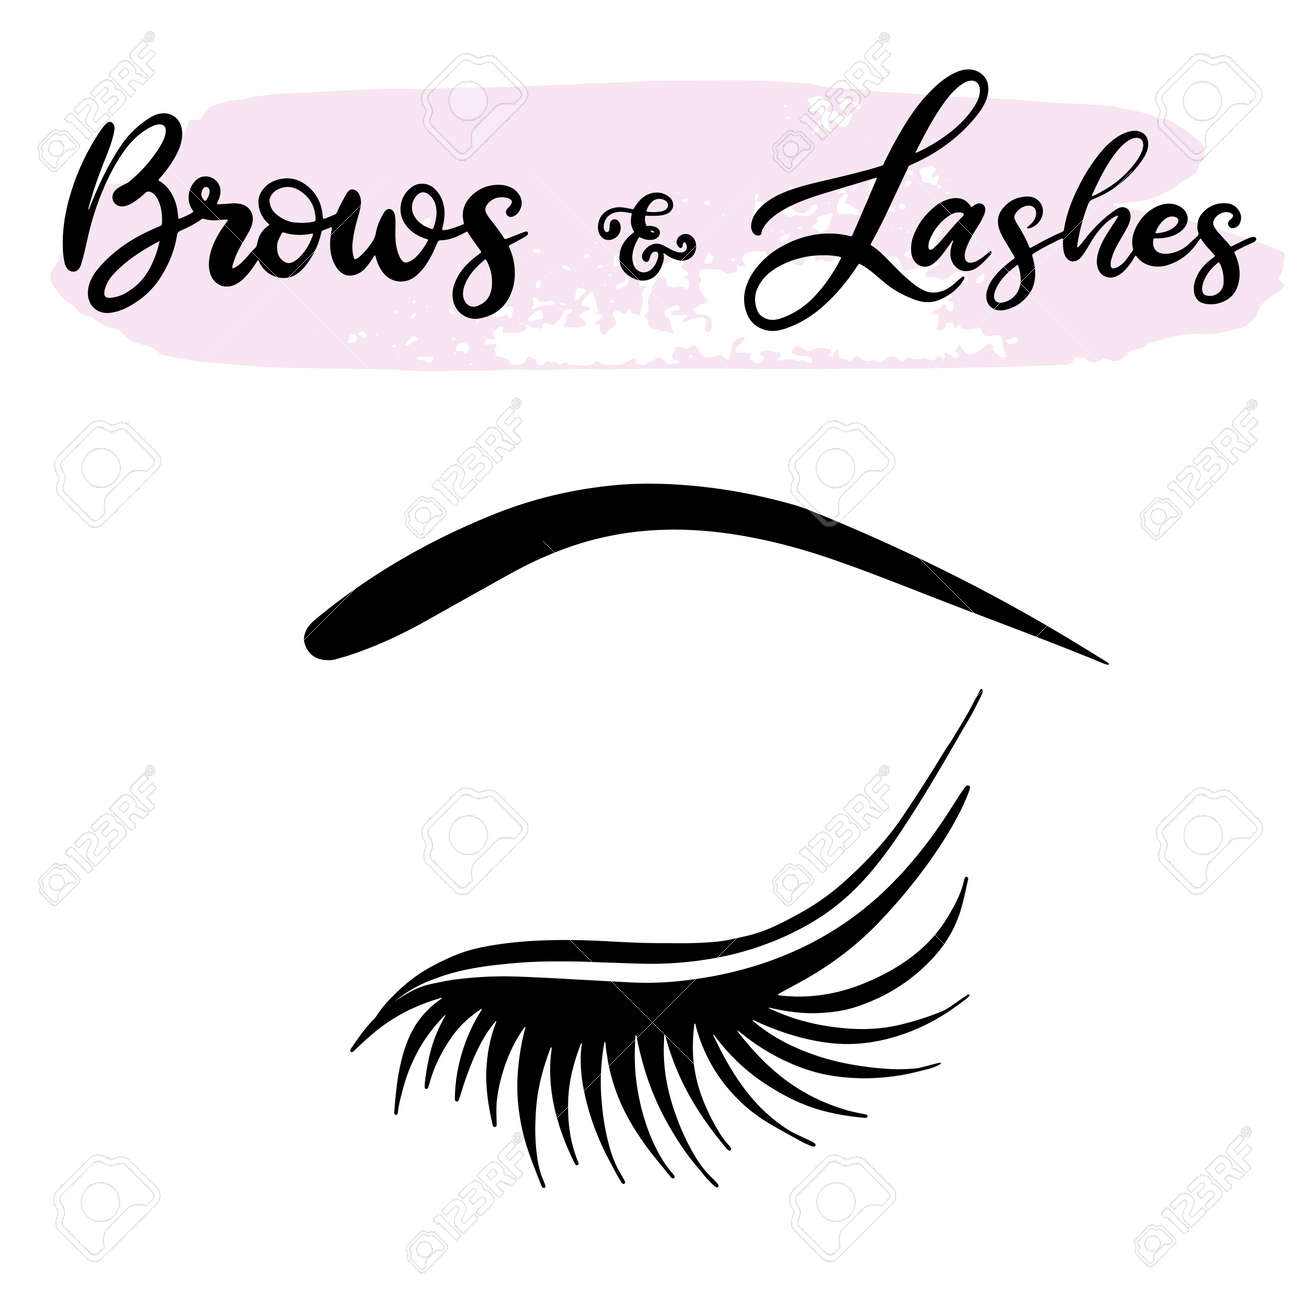 a9e0b1f2acf Illustration - Lashes lettering vector illustration for beauty salon,  fashion blog, logo, false eyelashes extensions maker, brow master,  professional makeup ...